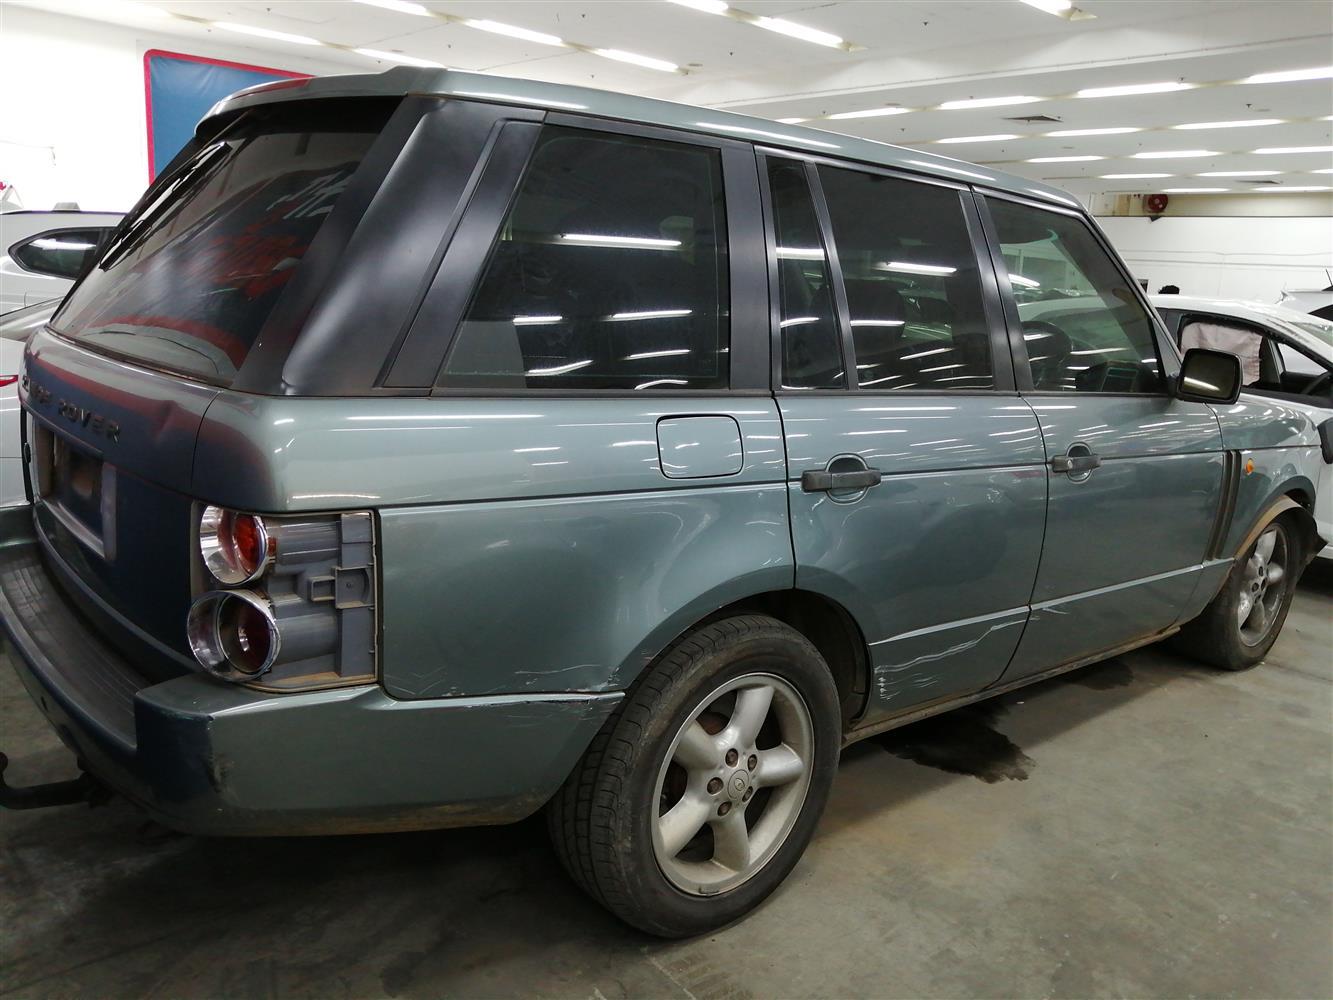 2003 Land Rover Range Rover Td6 HSE Code 2